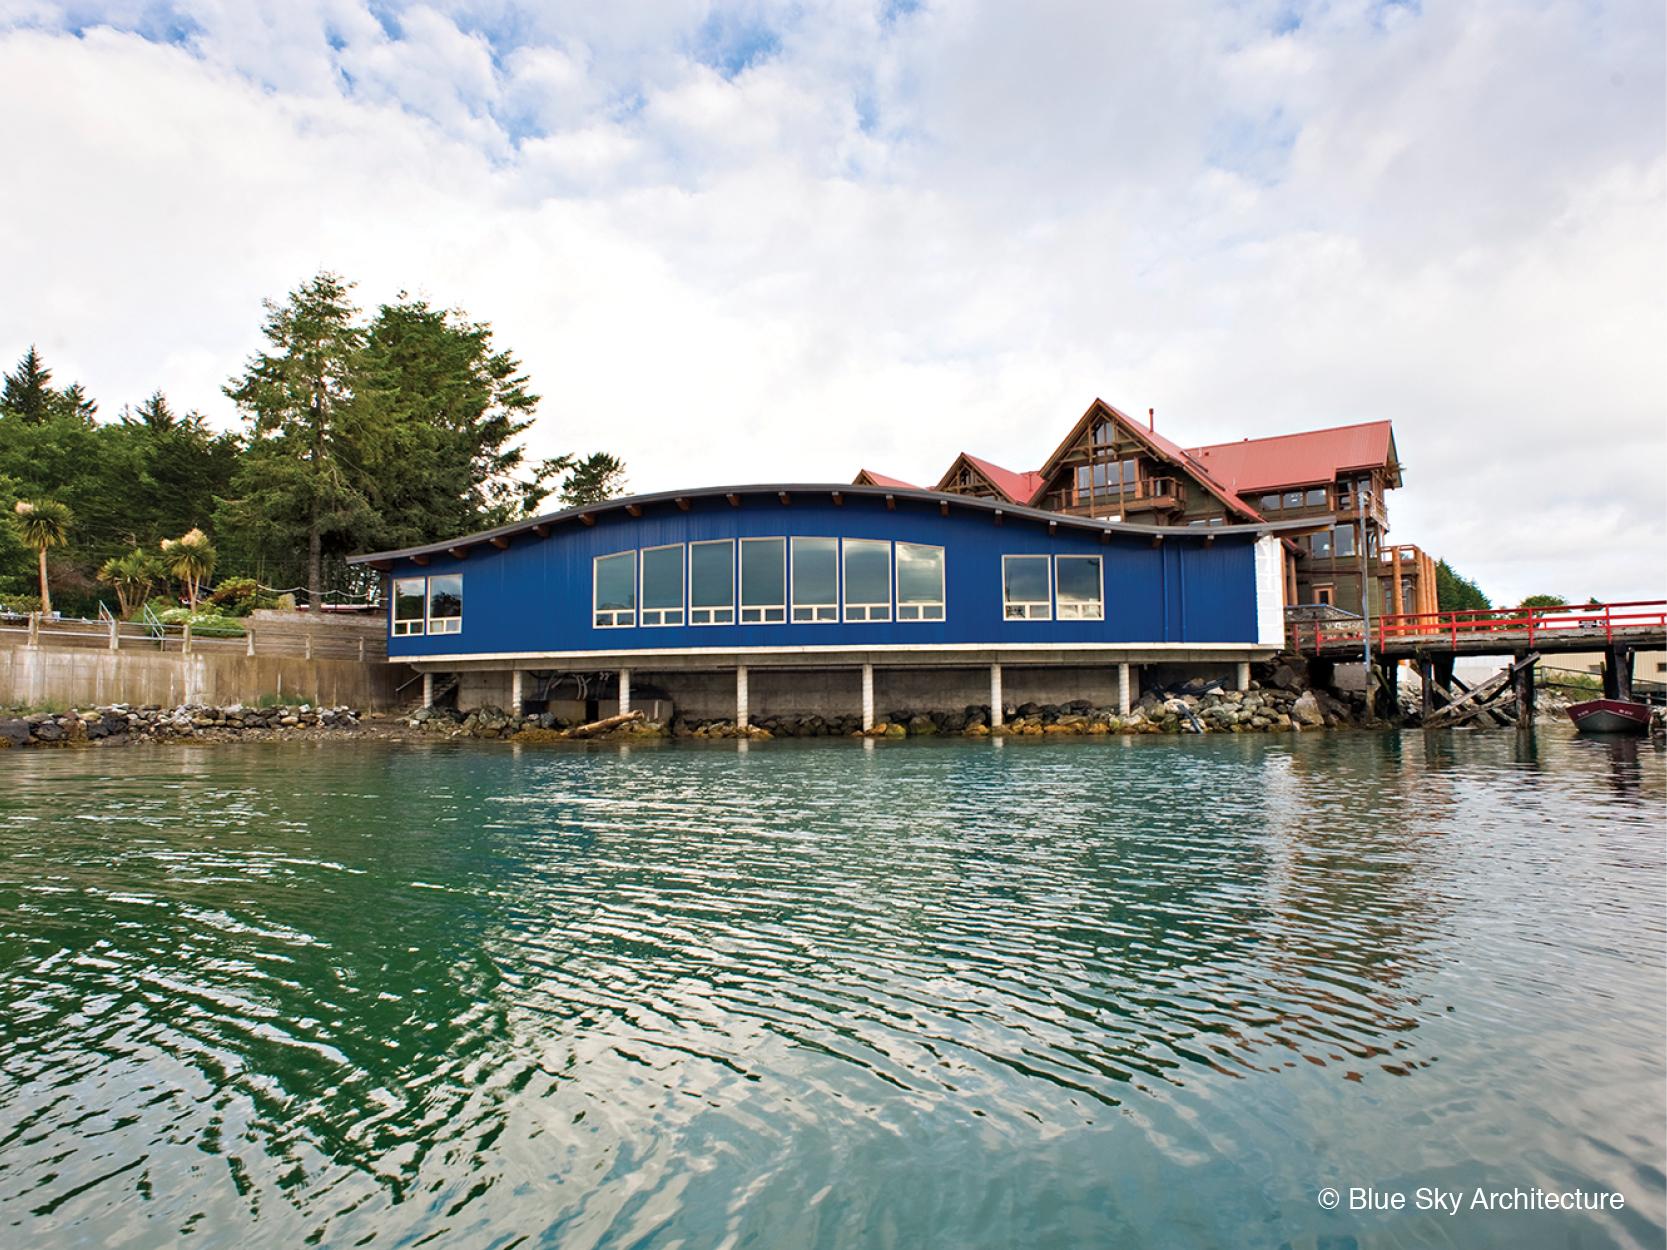 Harbourfront view of the Ucluelet Aquarium